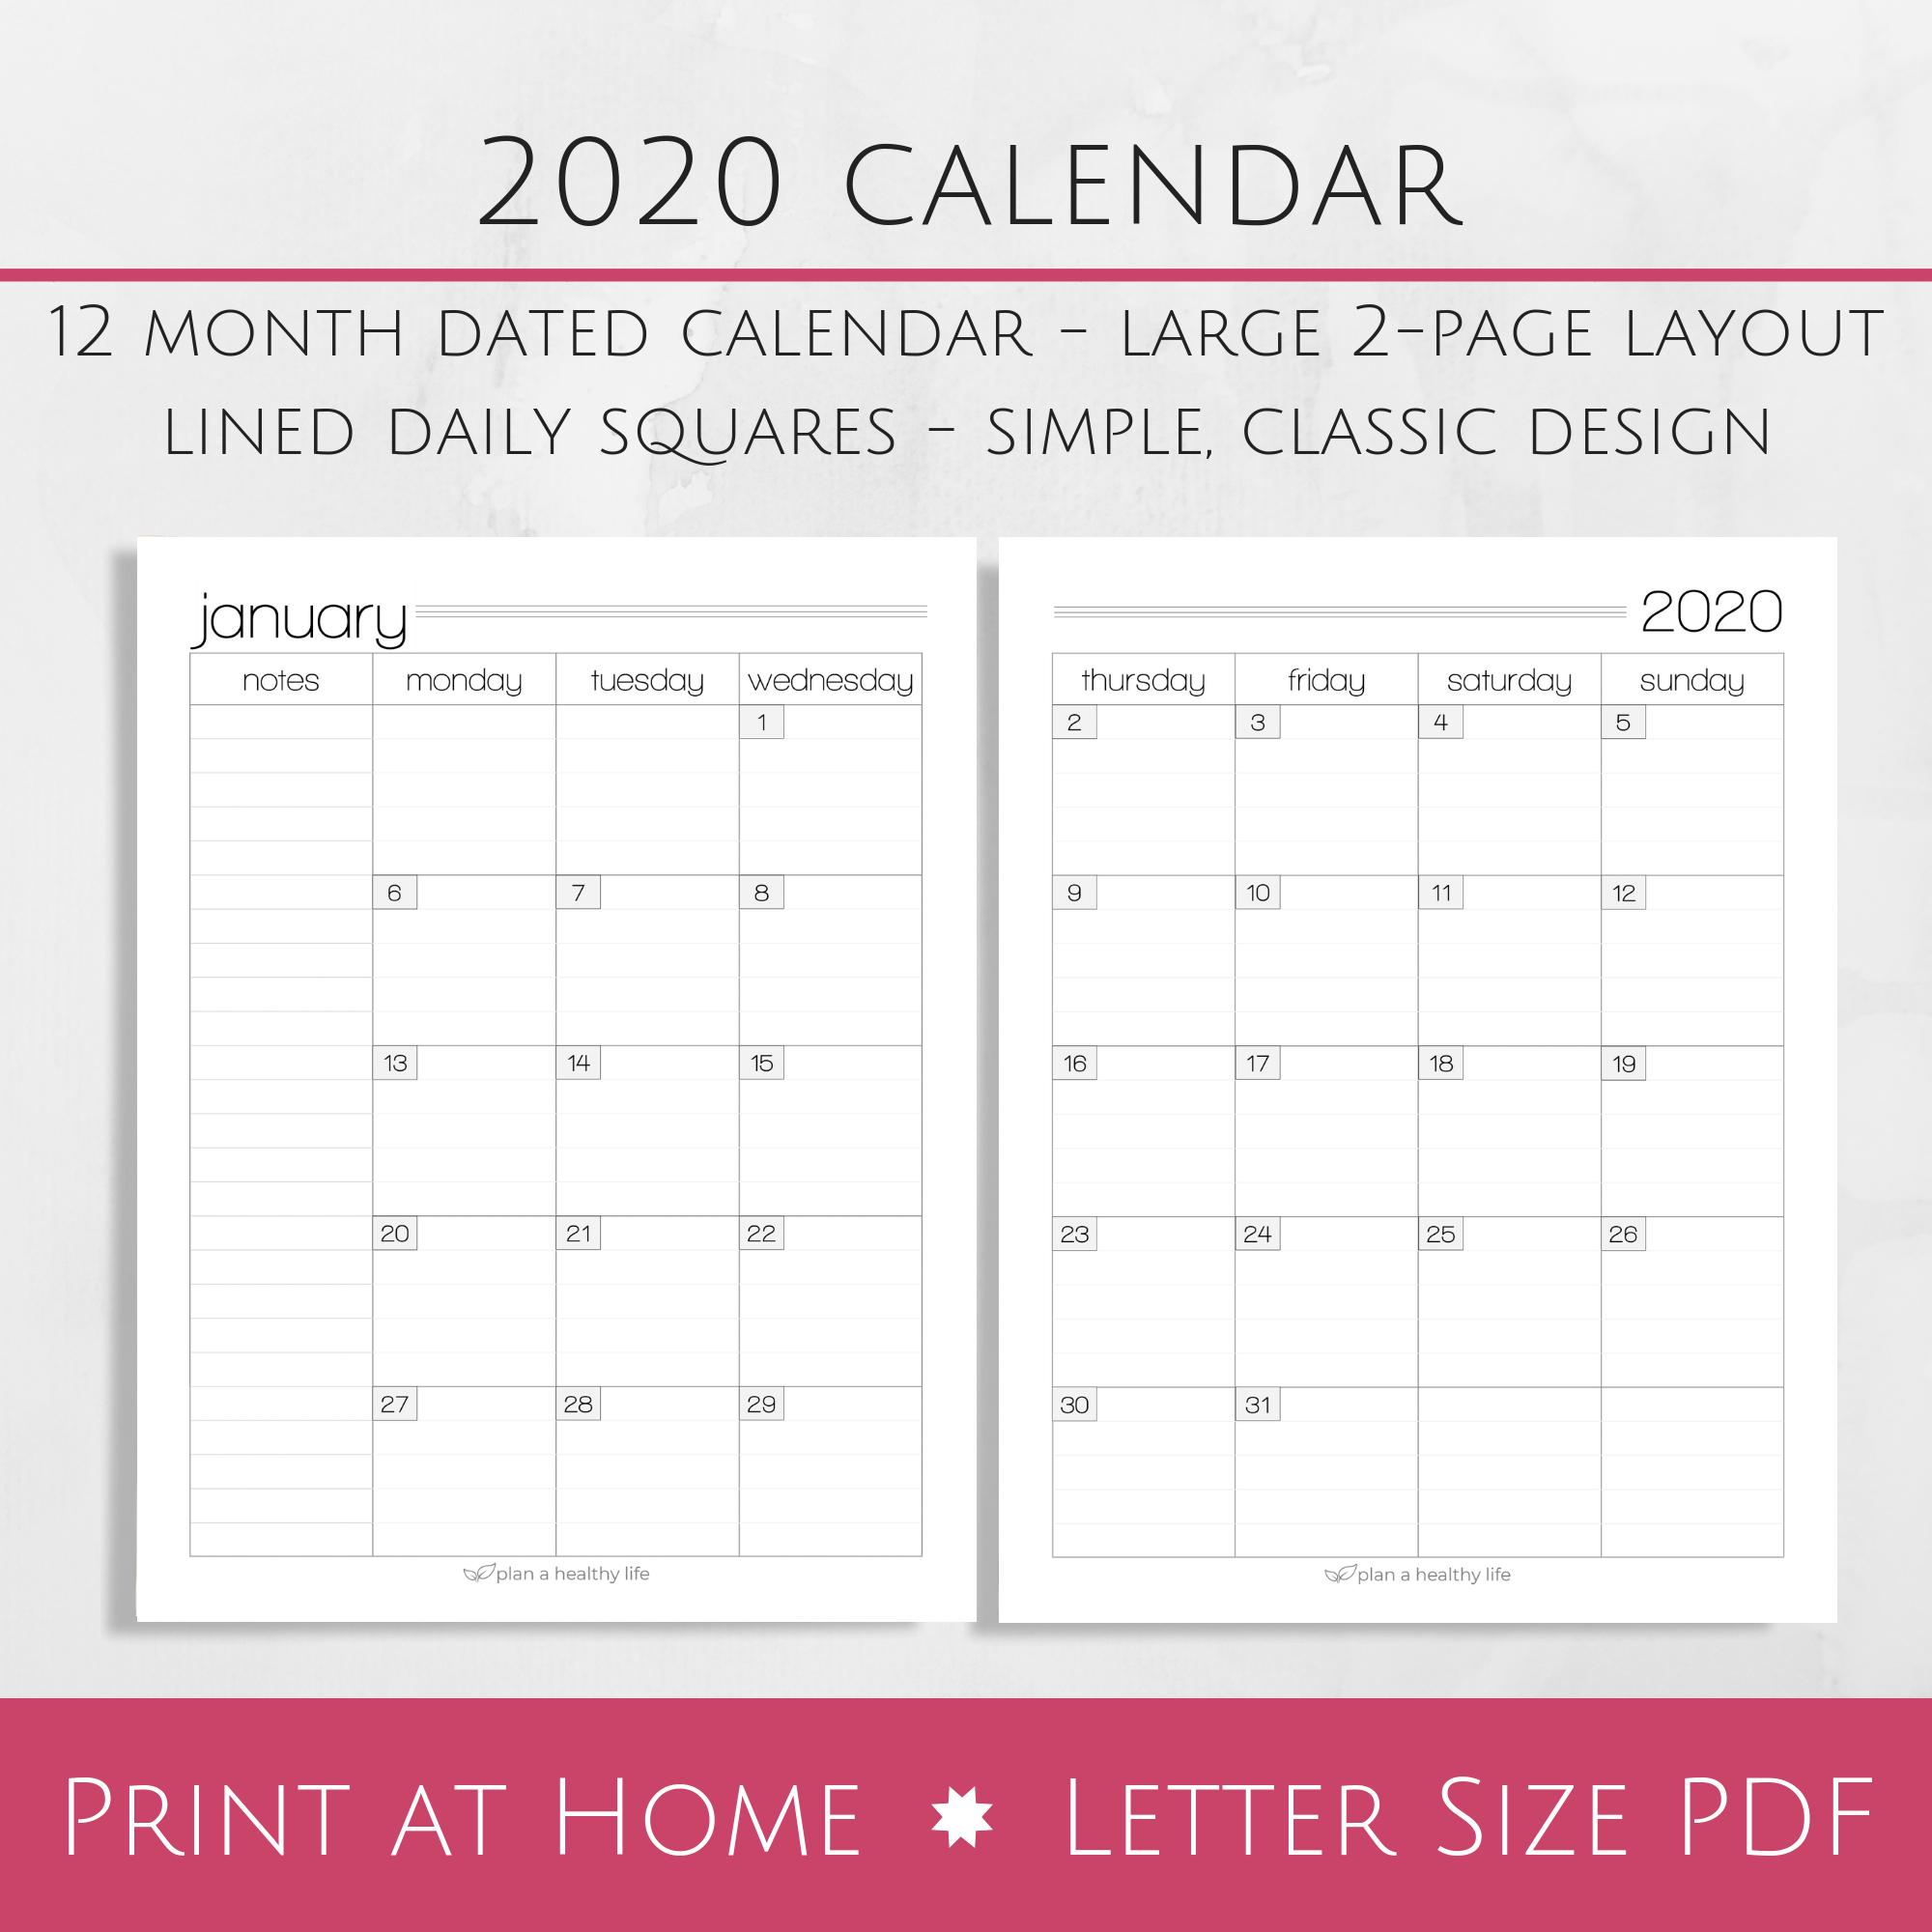 Printable 8.5 X 11 2020 Calendar | Calendar Template 8 1/2 By 11 Inch Monthly Calendar